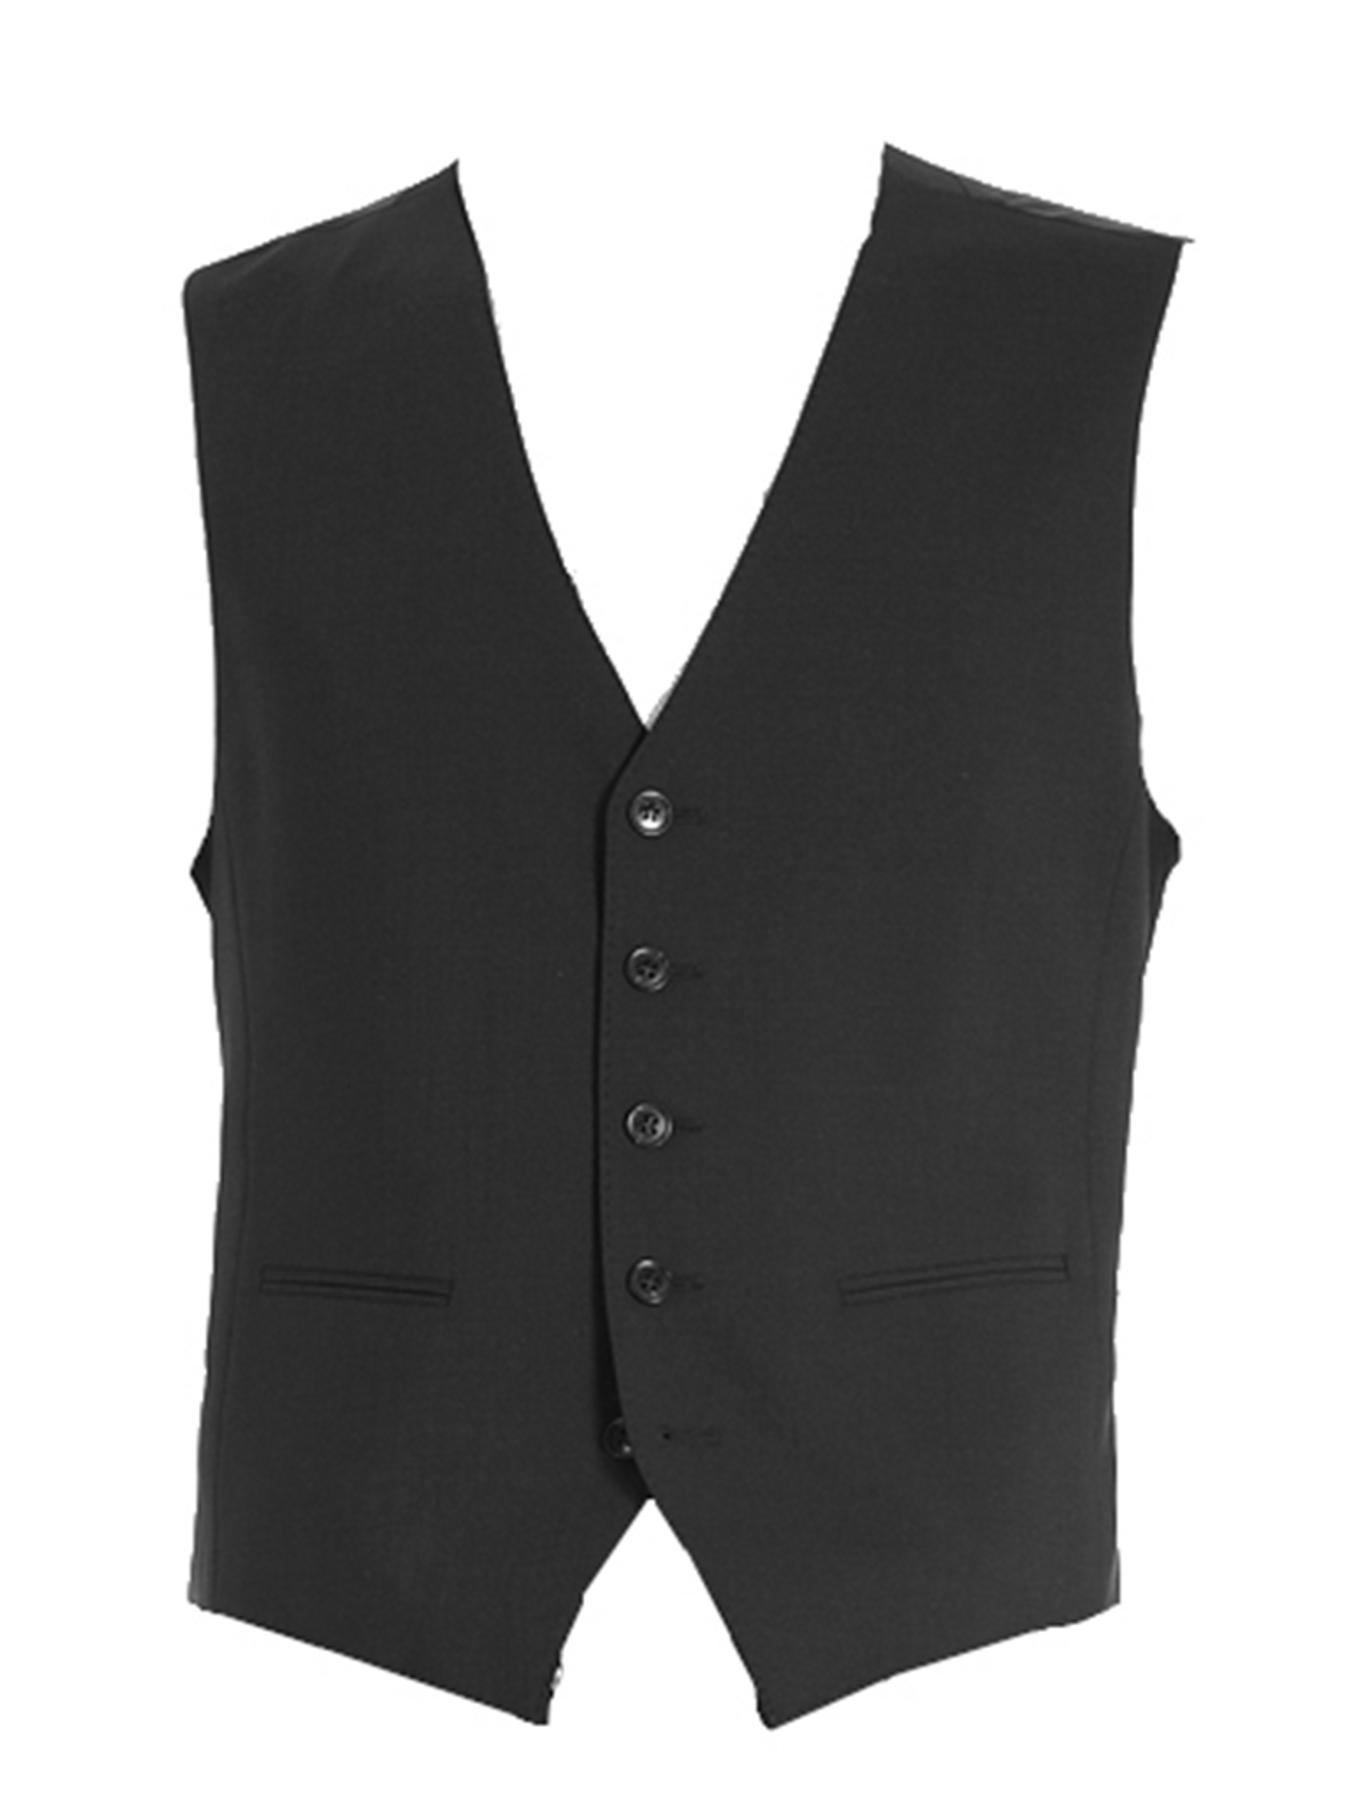 Benvenuto Black - Regular Fit - Herren Baukasten Weste (Artikel: 20097, Modell: 60211) – Bild 1